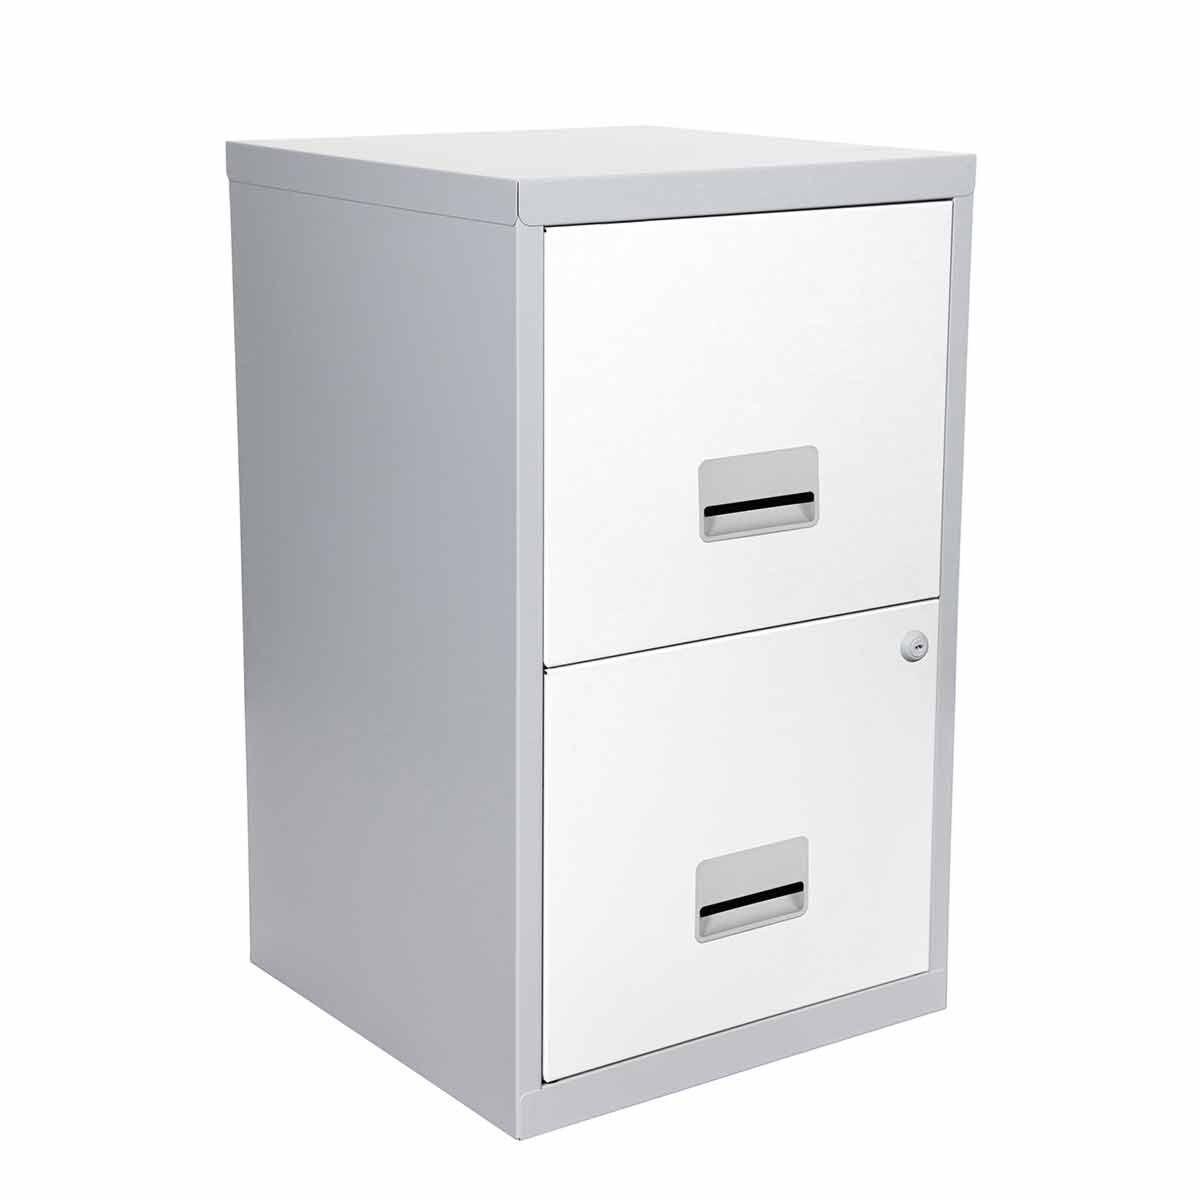 Pierre Henry Metal 2 Drawer Maxi Filing Cabinet A4 Slvr/Wht